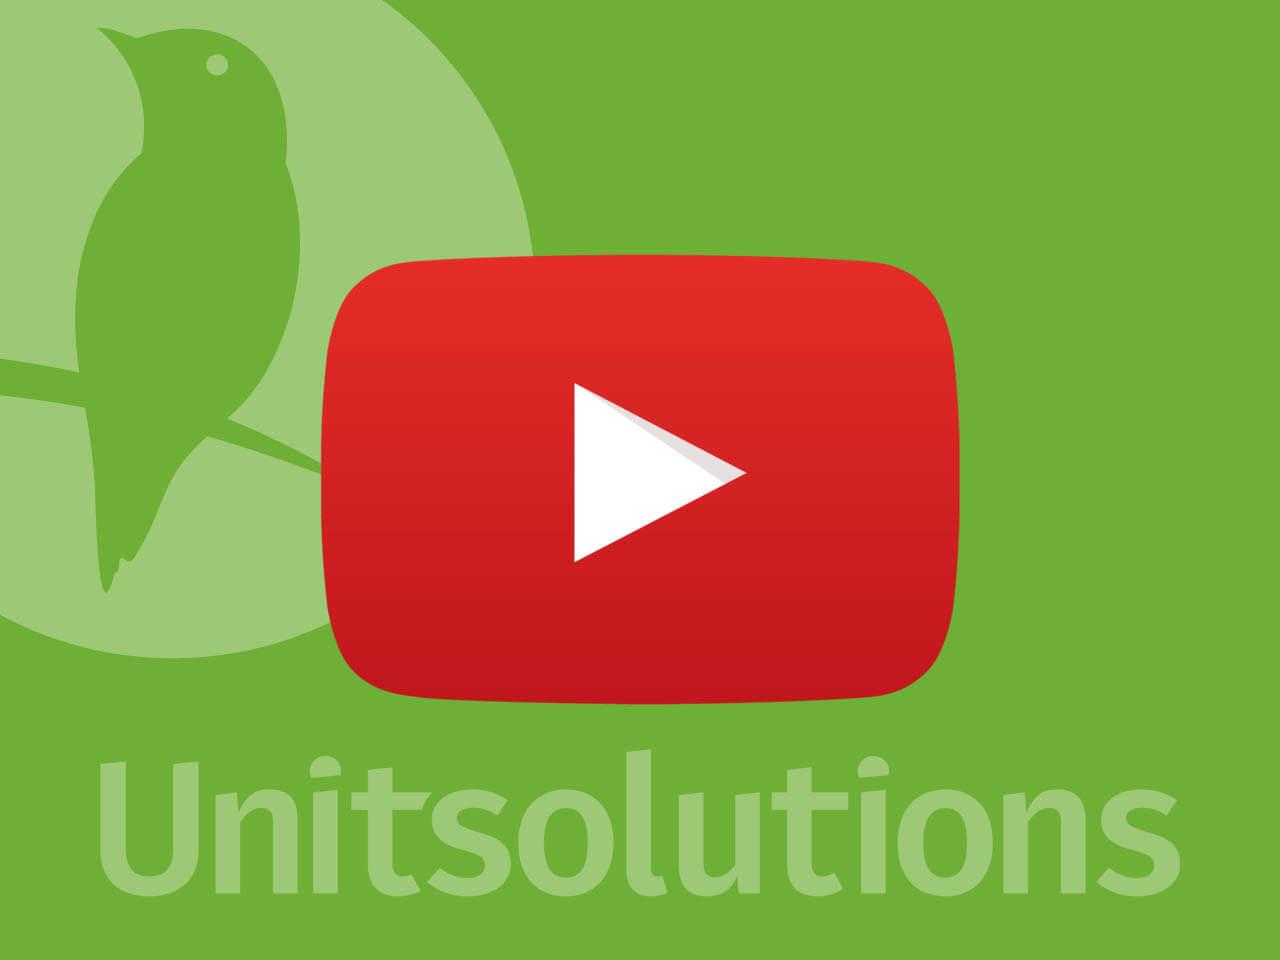 Unitsolutions на Youtube